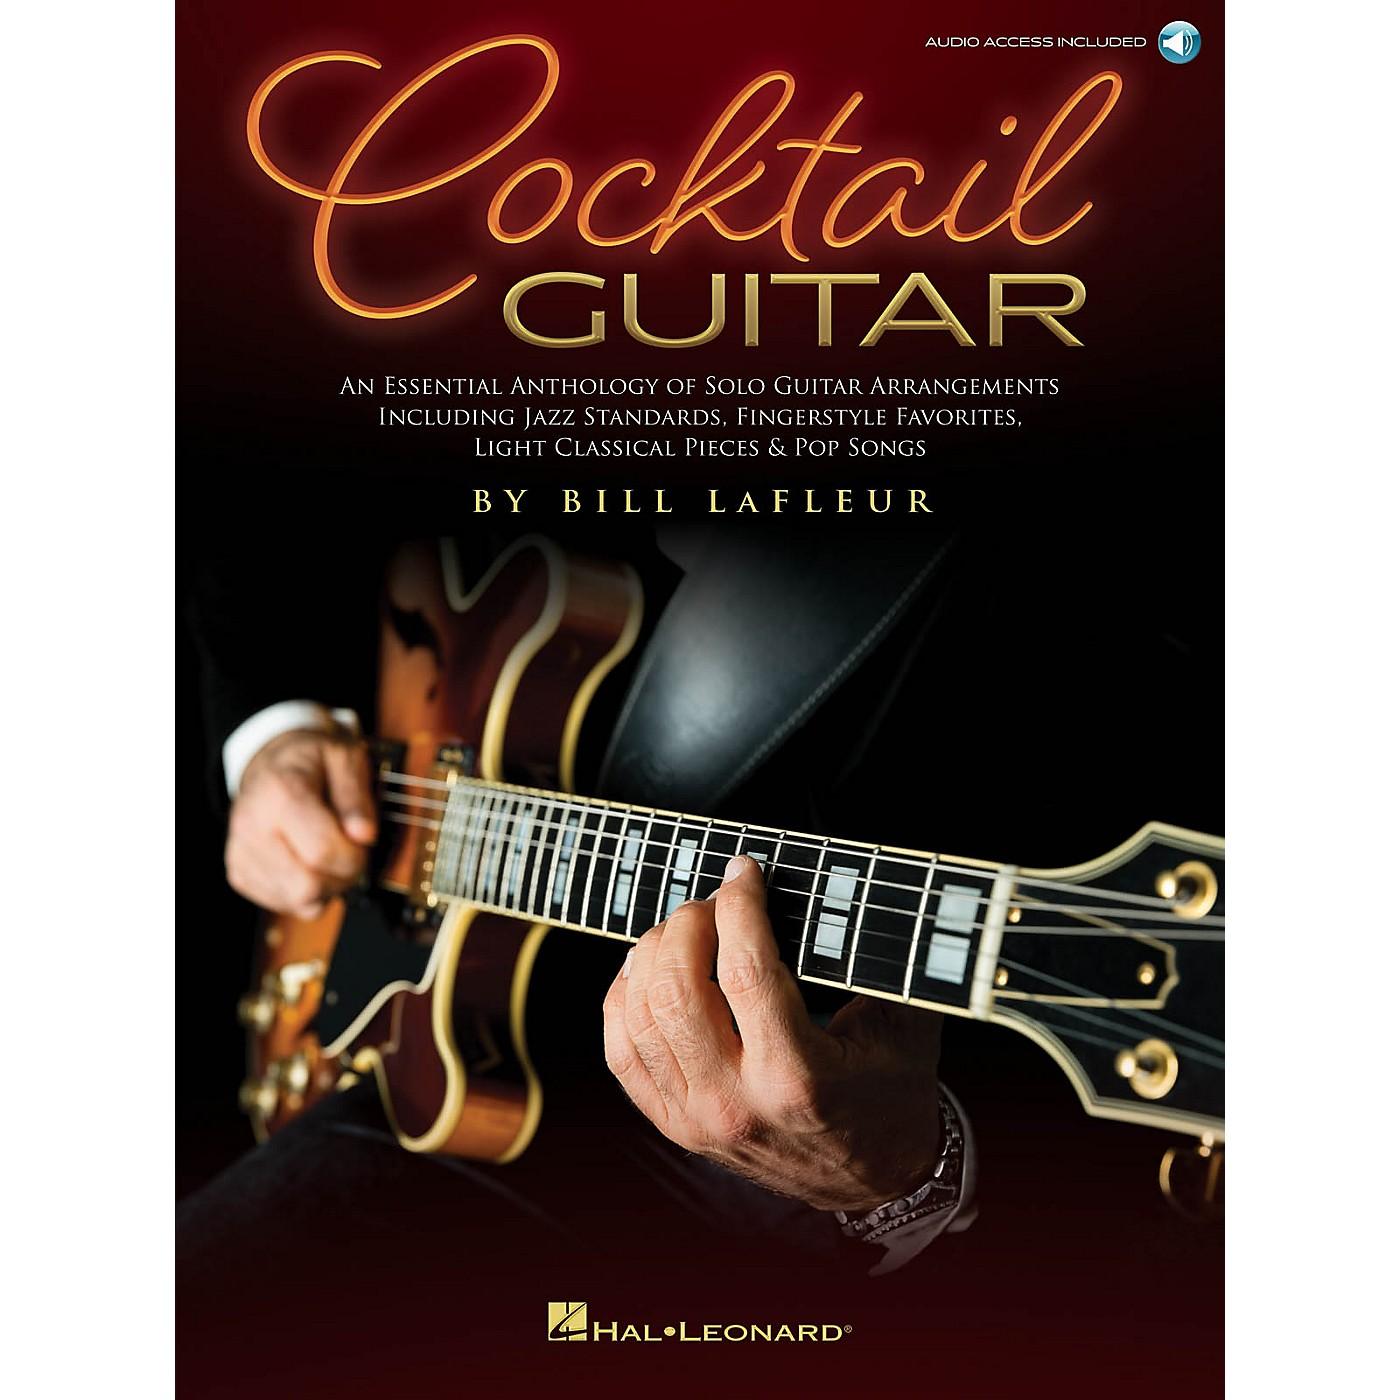 Hal Leonard Cocktail Guitar - An Essential Anthology Of Solo Guitar Arrangements Book/Audio Online thumbnail